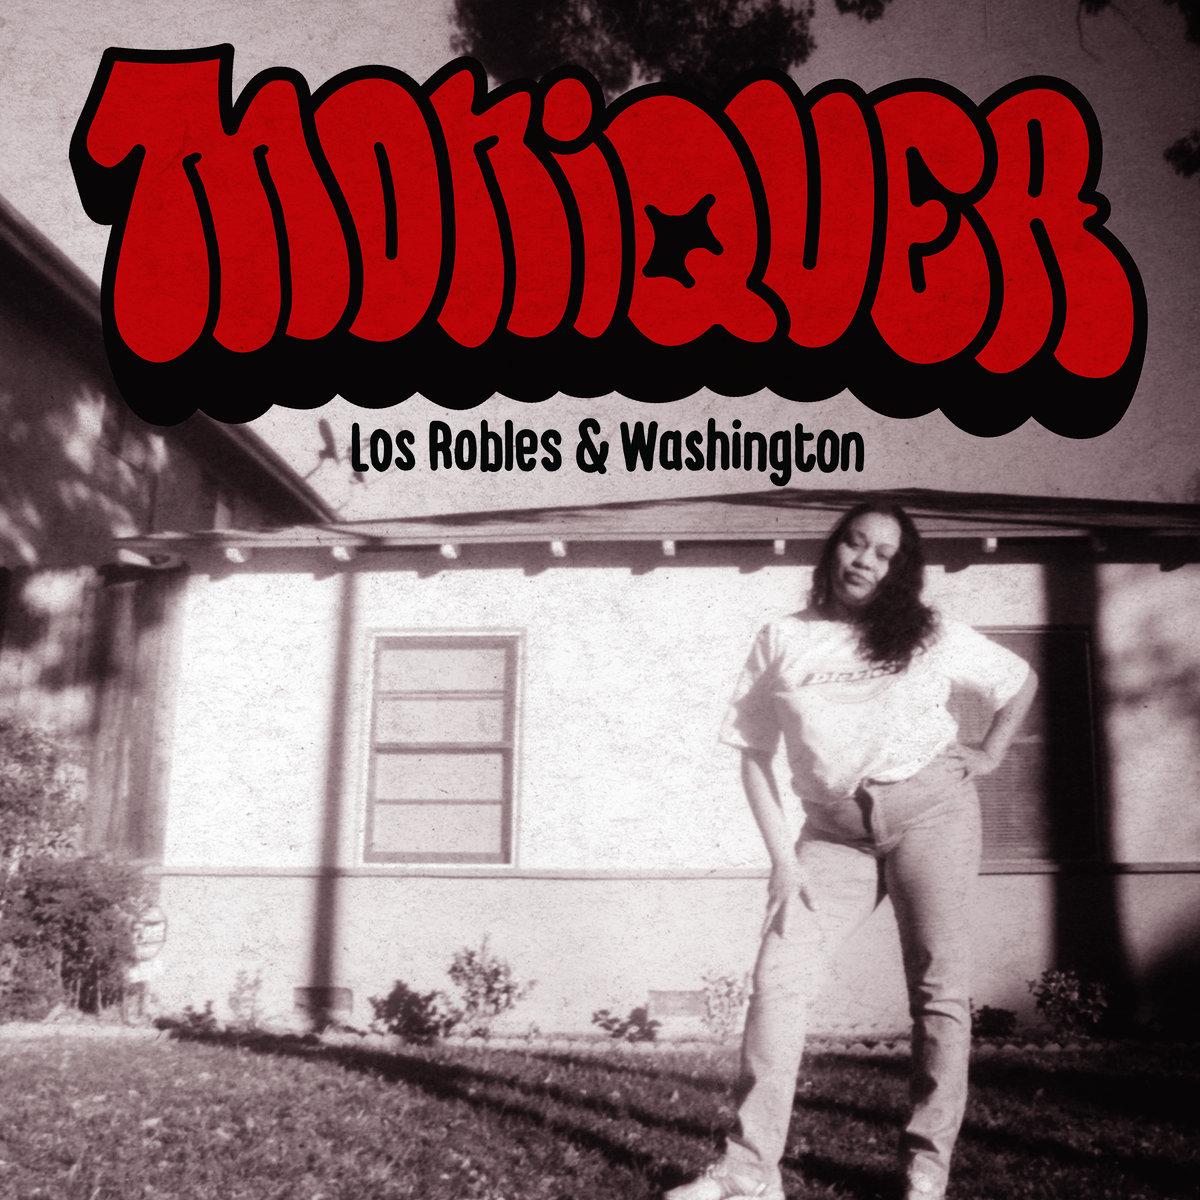 Moniquea — «Los Robles & Washington»